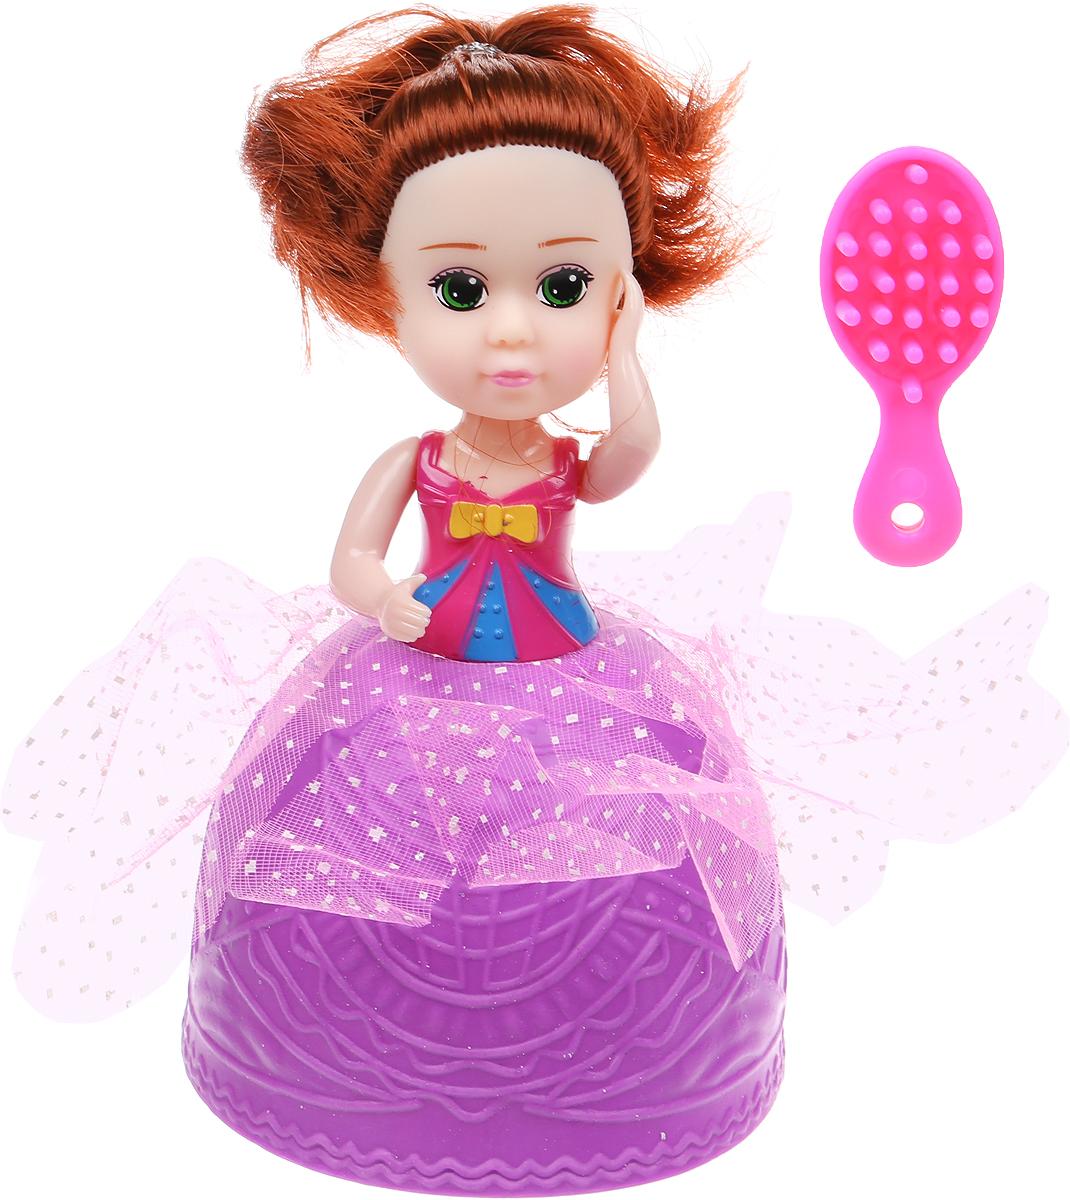 JUNnew Мини-кукла Cupcake Jelato цвет фиолетовый mermaid cupcake stand